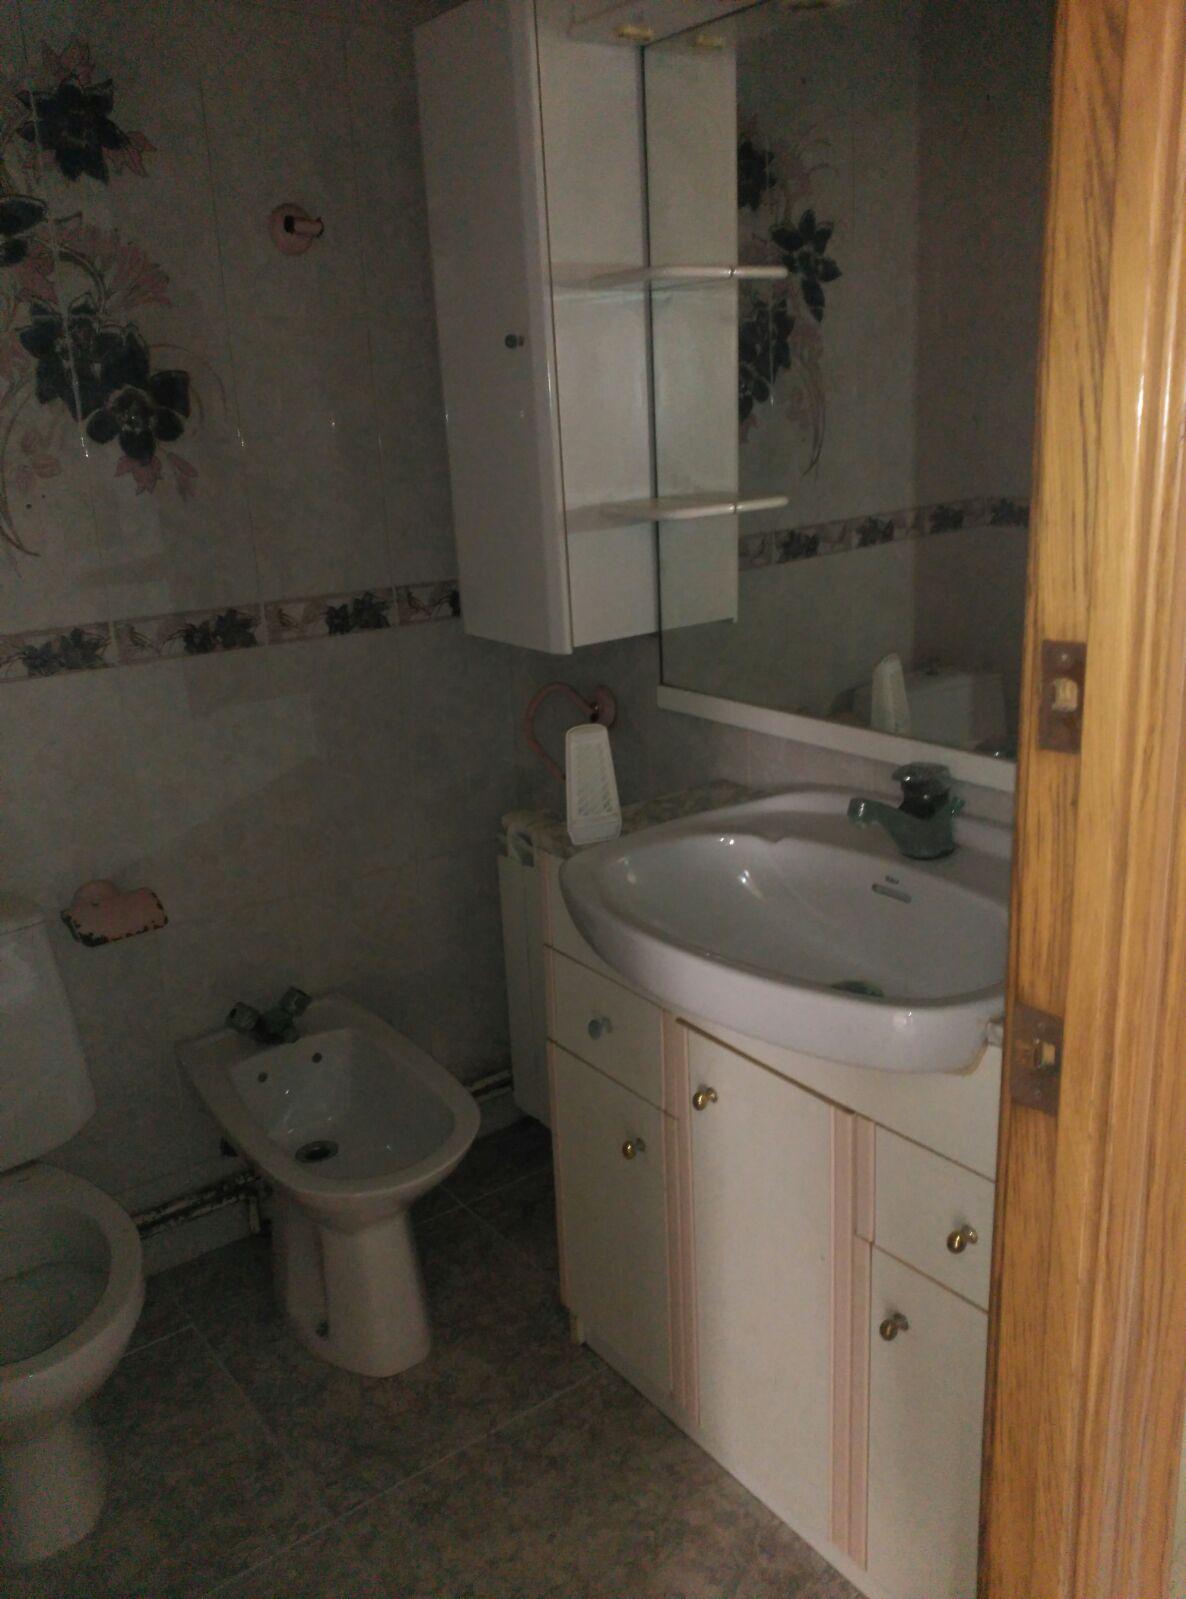 Piso en venta en Sant Fruitós de Bages, Barcelona, Calle Joan Xxiii, 62.000 €, 2 habitaciones, 1 baño, 67 m2